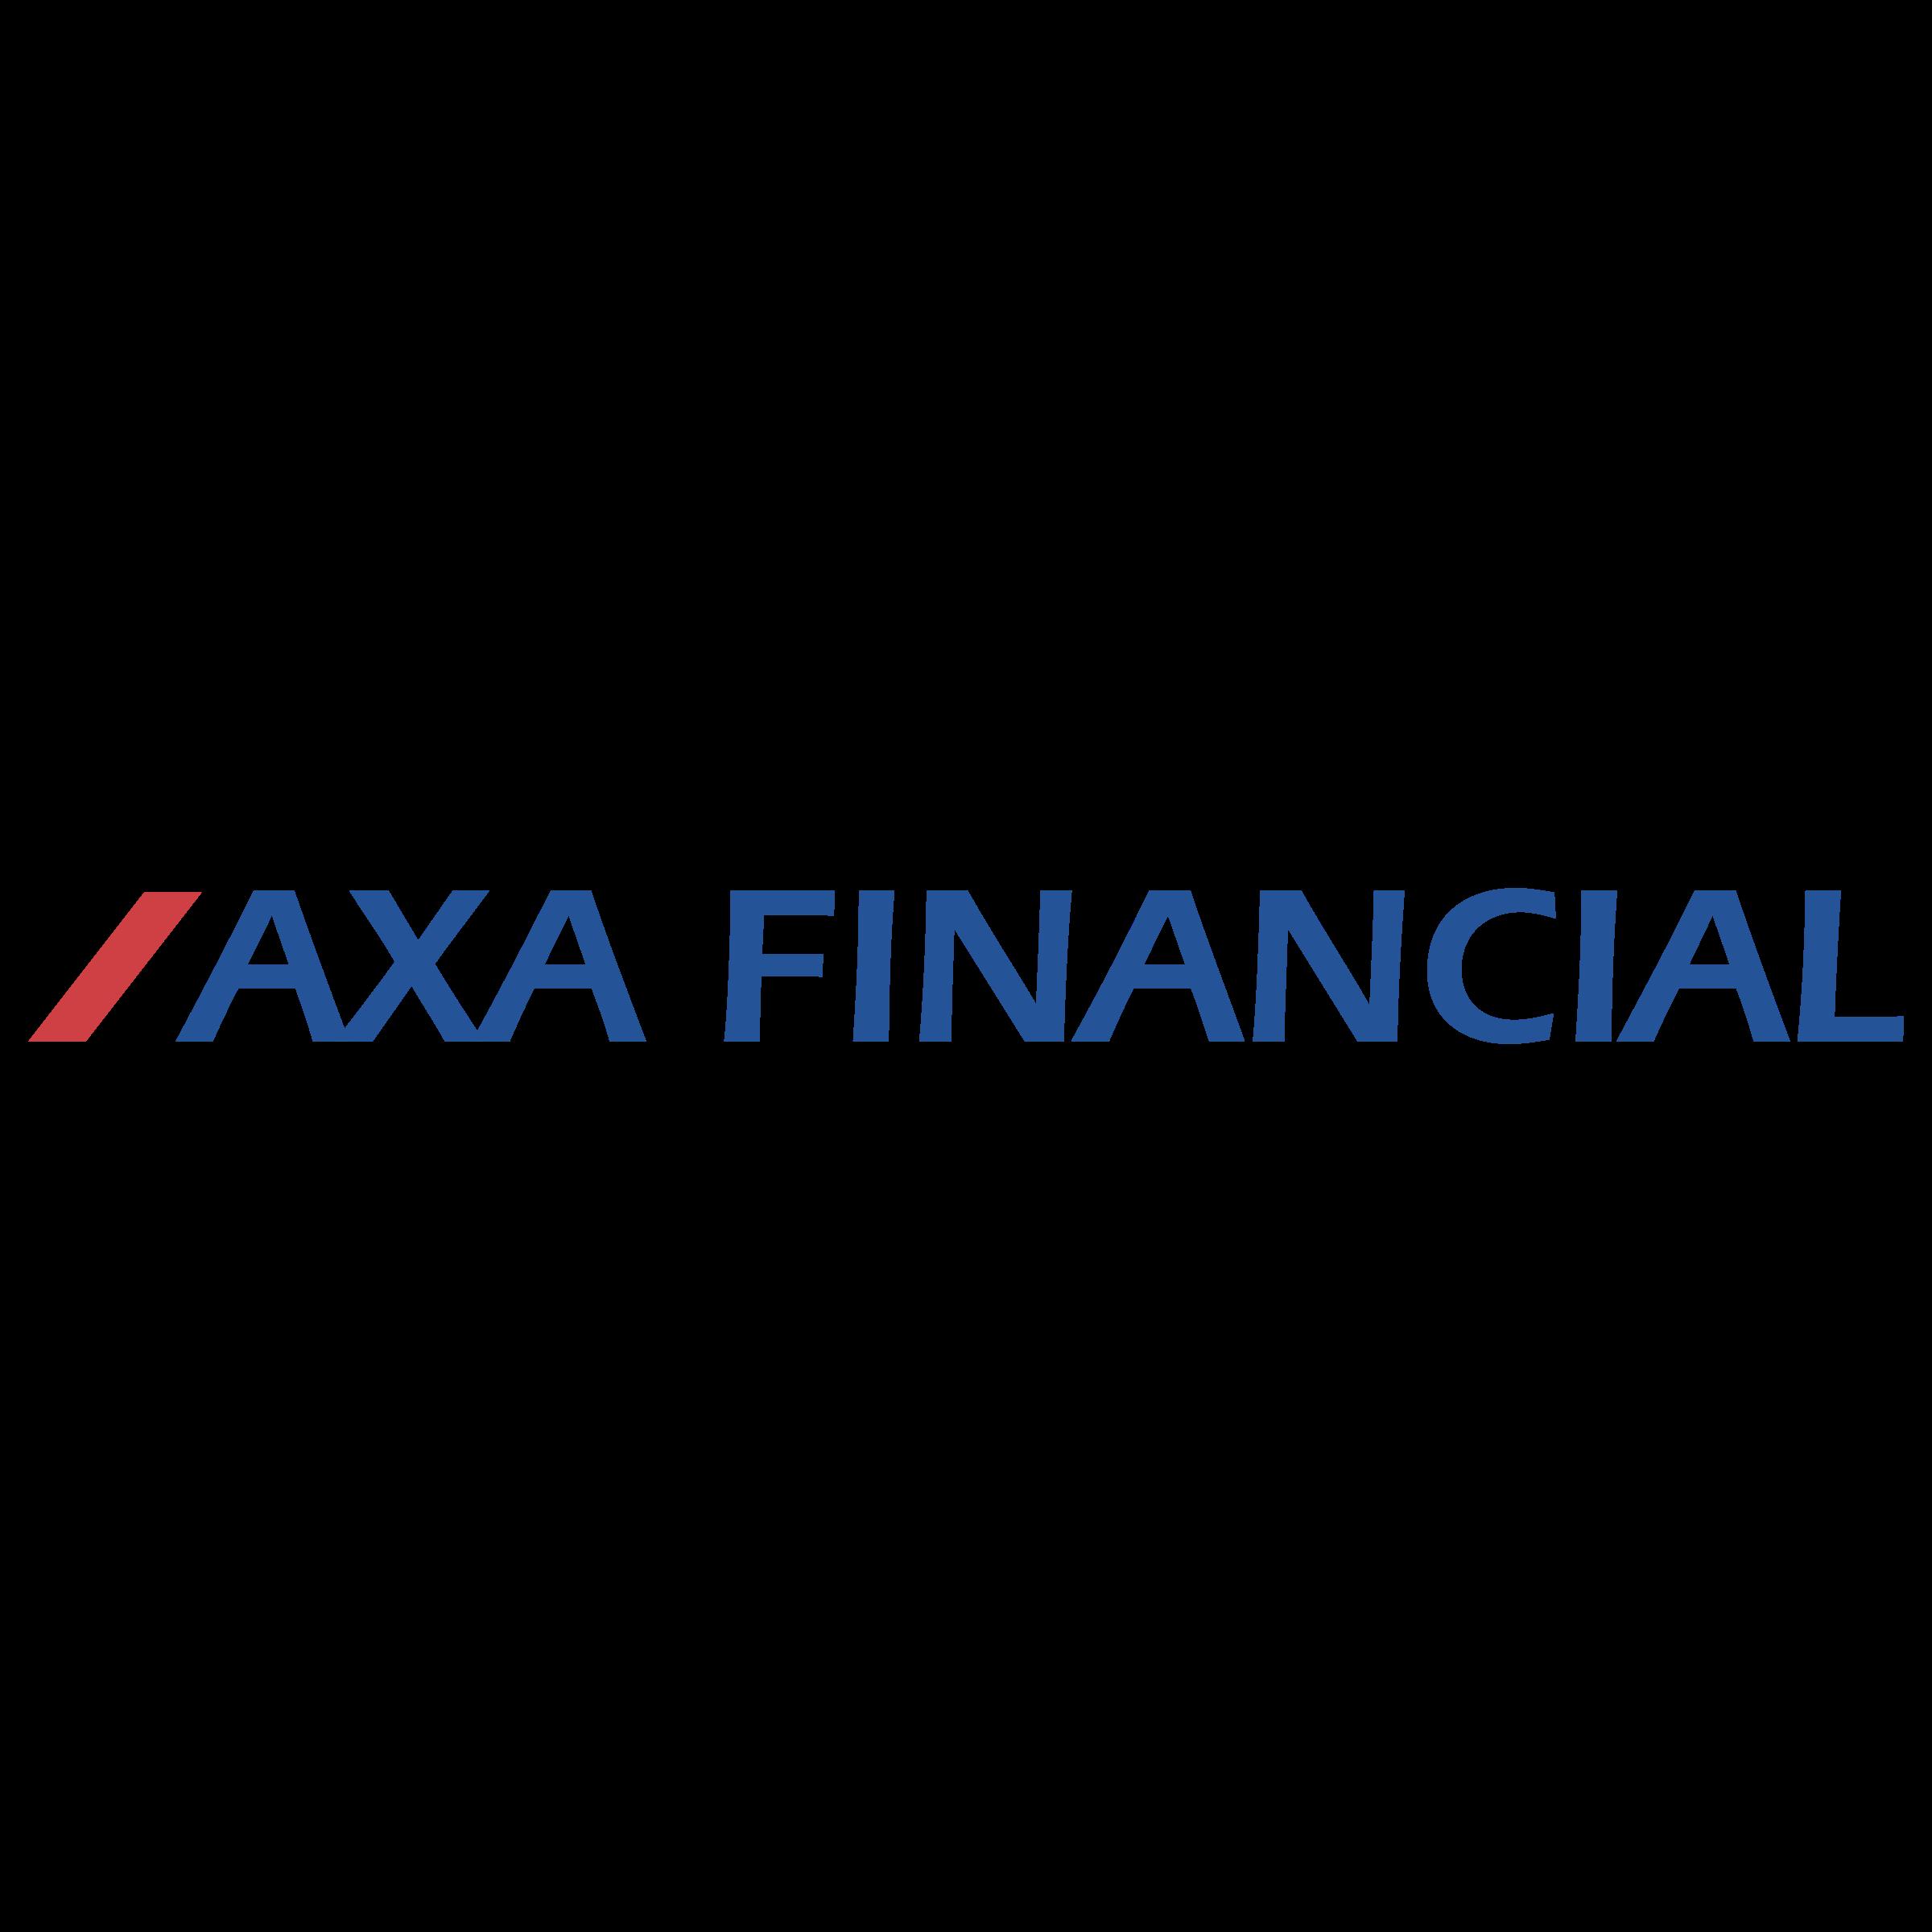 axa financial AXA Financial Logo PNG Transparent